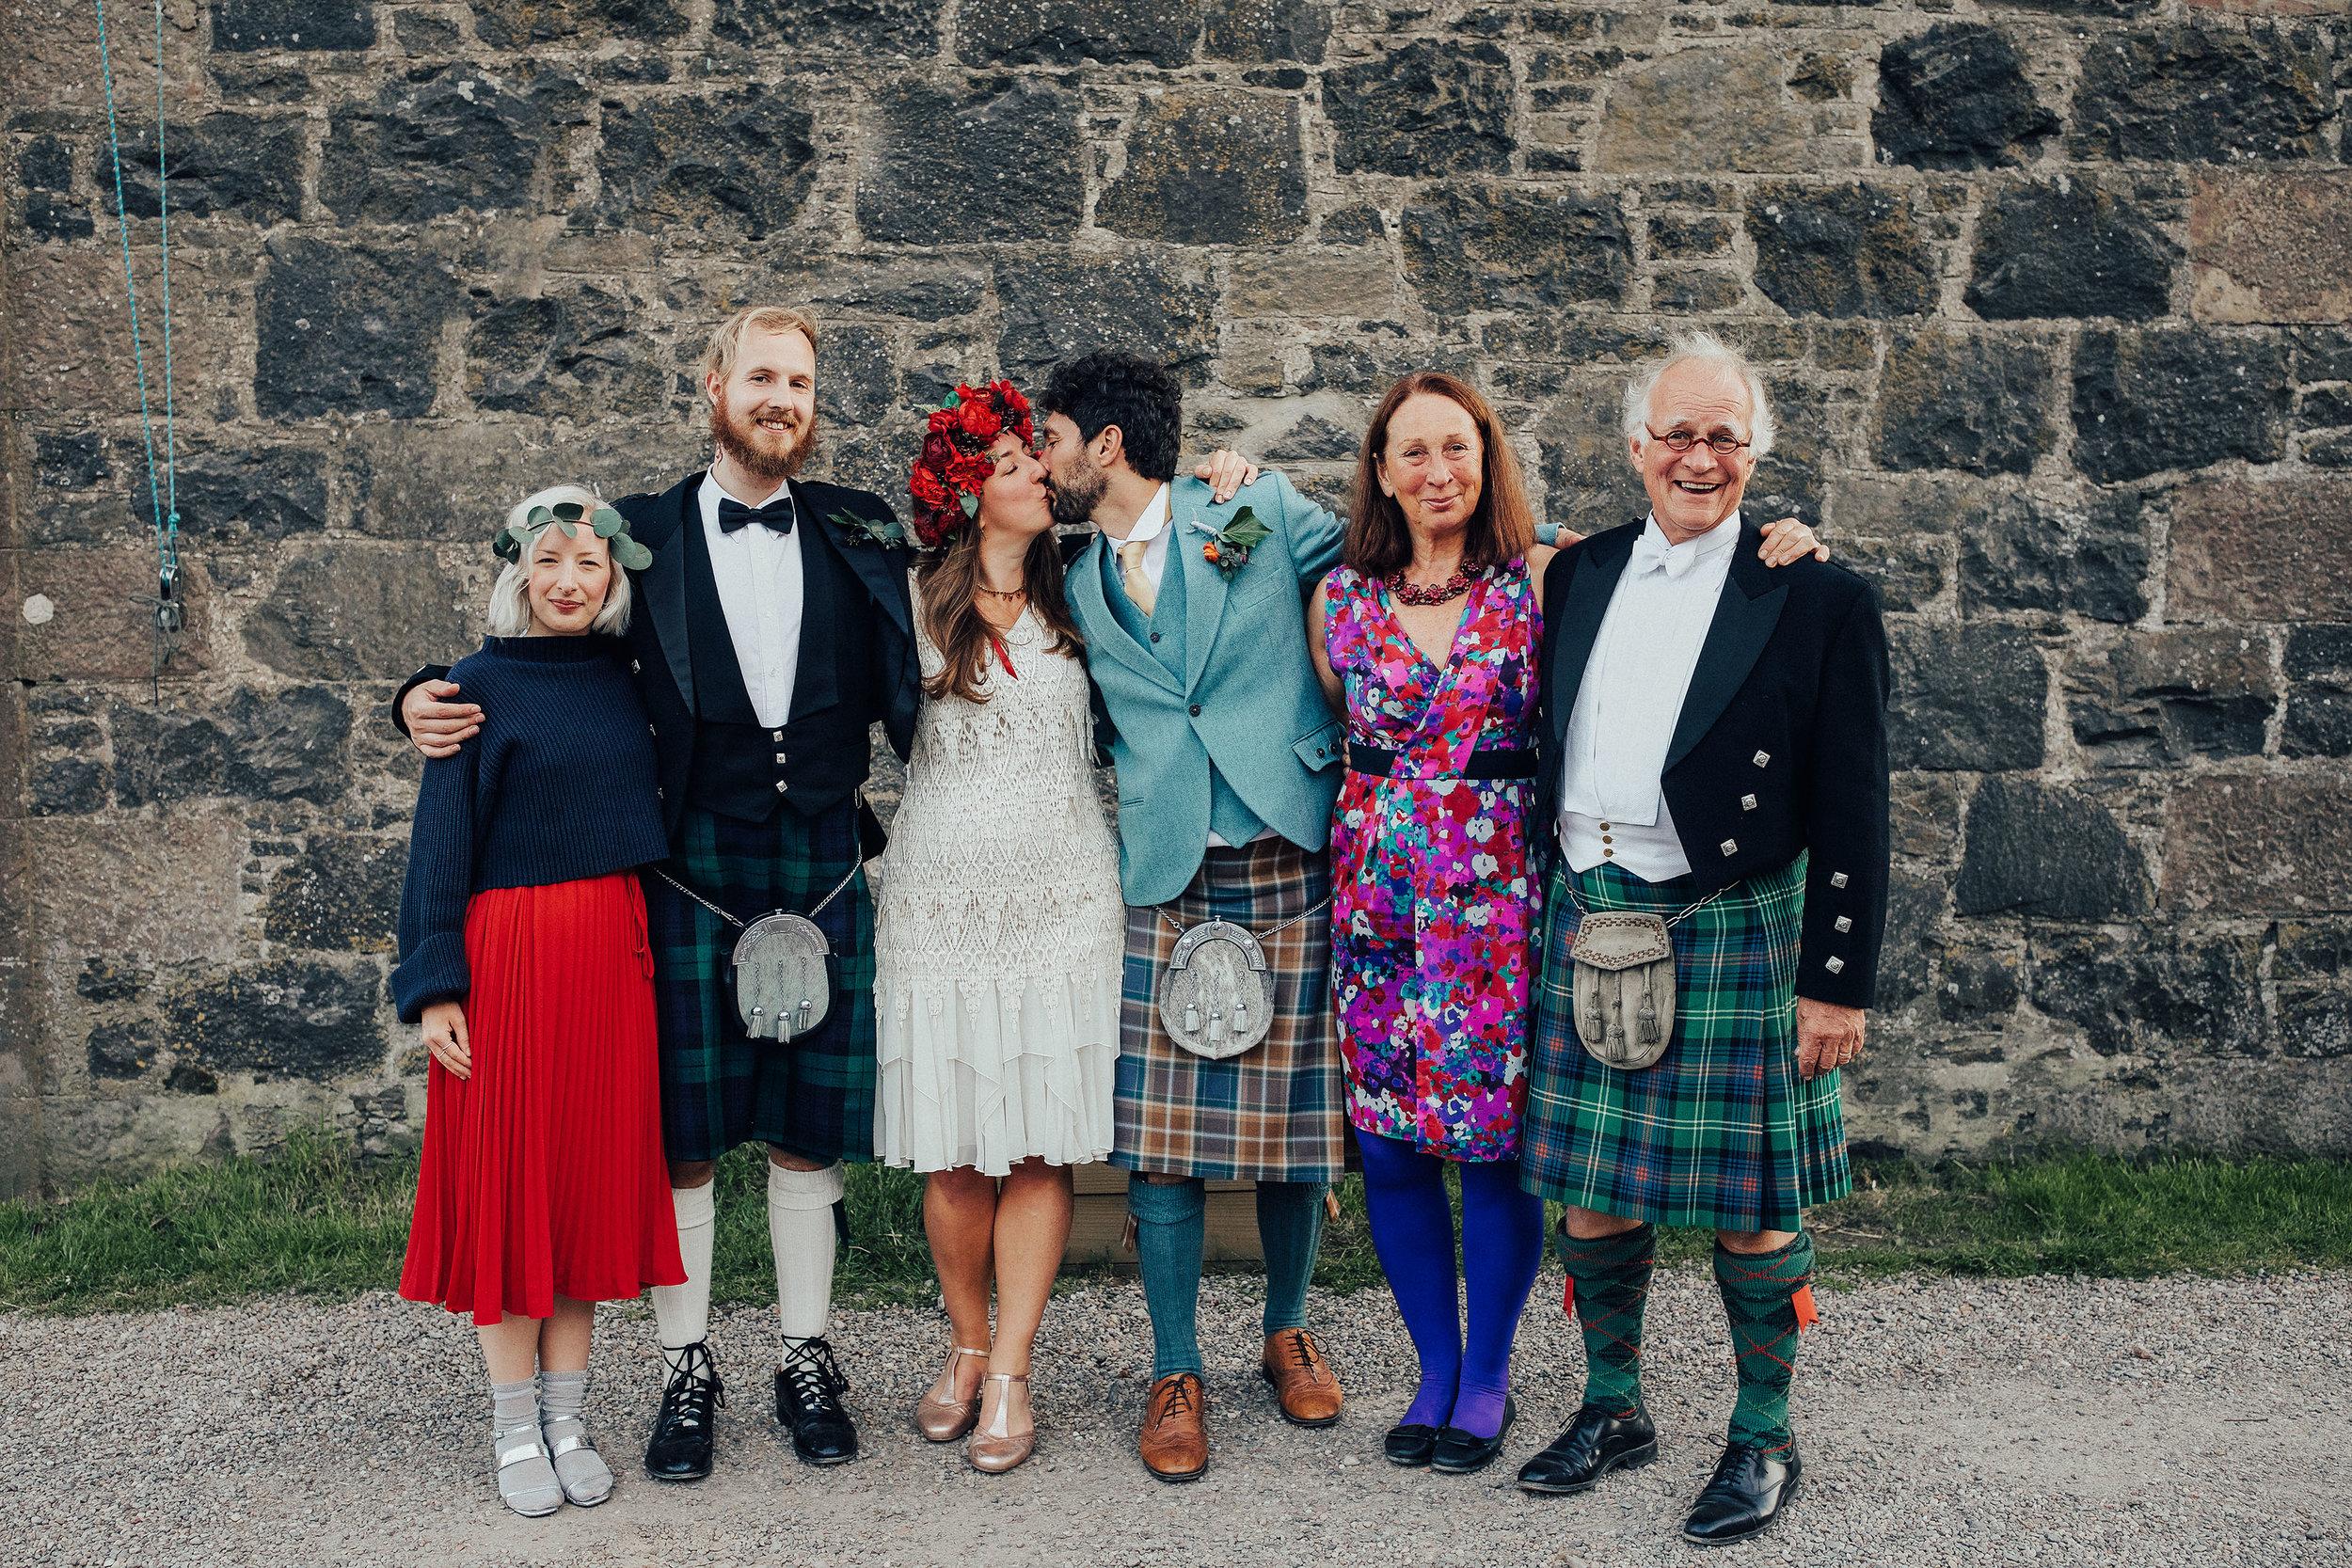 COMRIE_CROFT_WEDDINGS_PJ_PHILLIPS_PHOTOGRAPHY_182.jpg